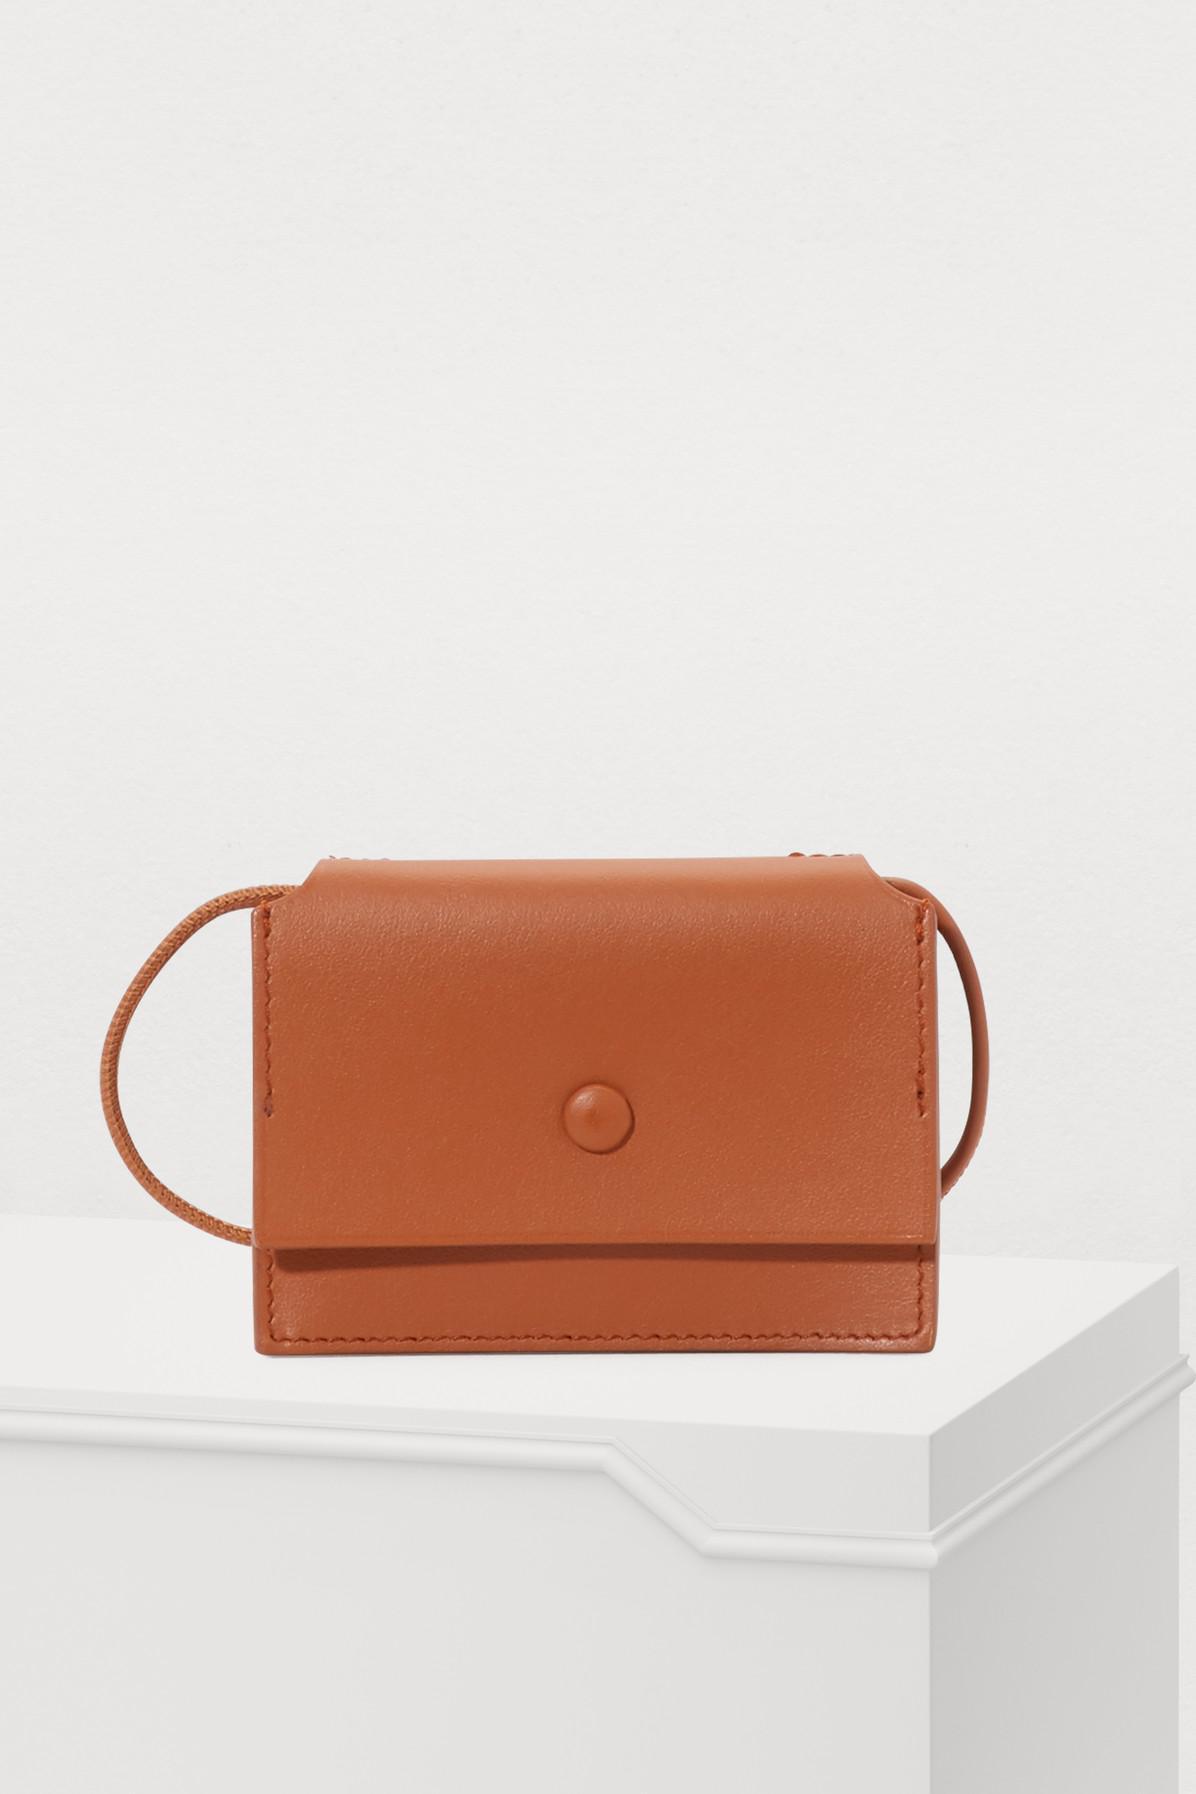 02b334e261960 Lyst - Acne Studios Mini Crossbody Bag in Brown